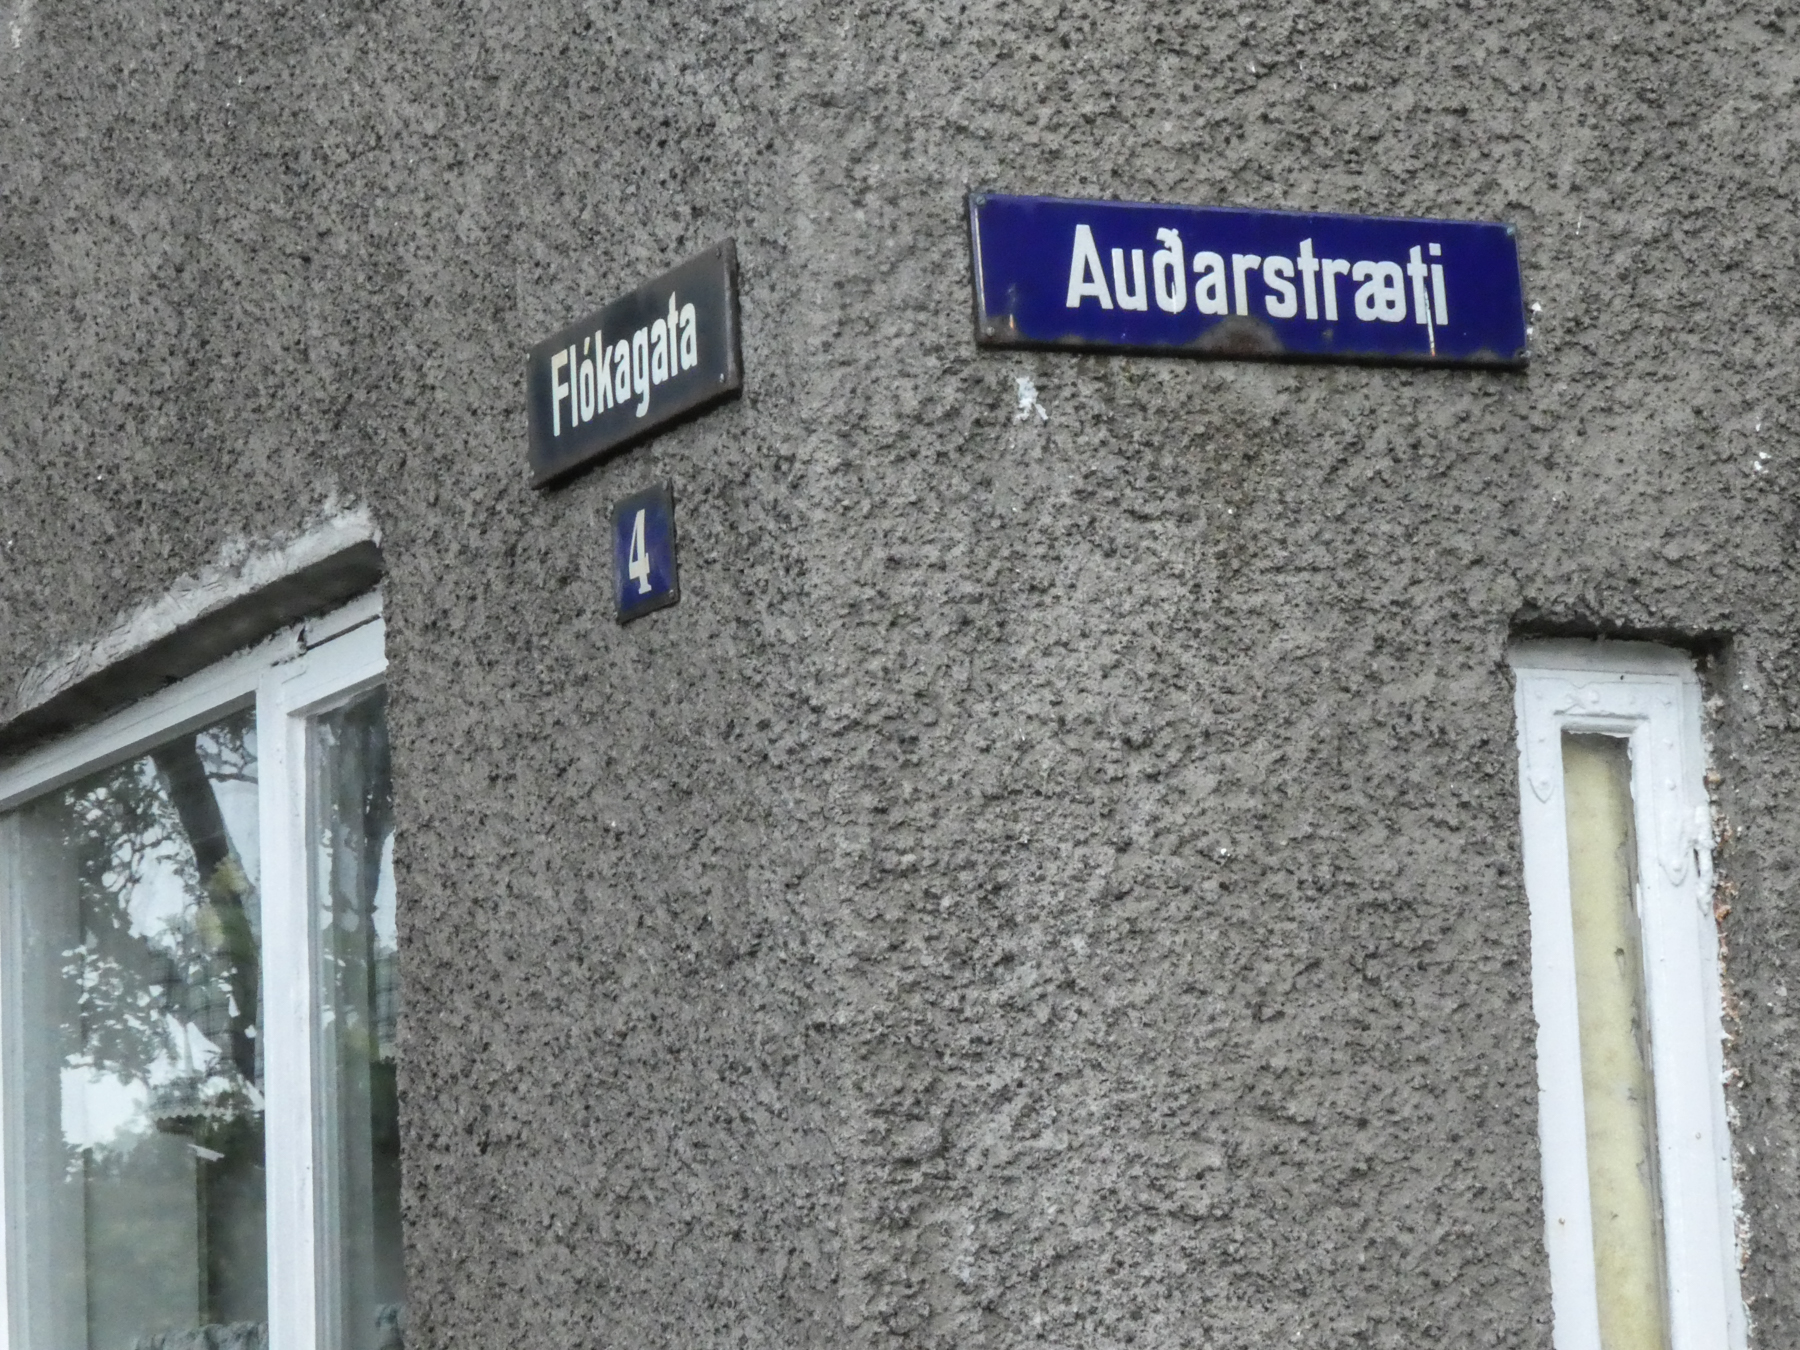 Aud (Unns) street